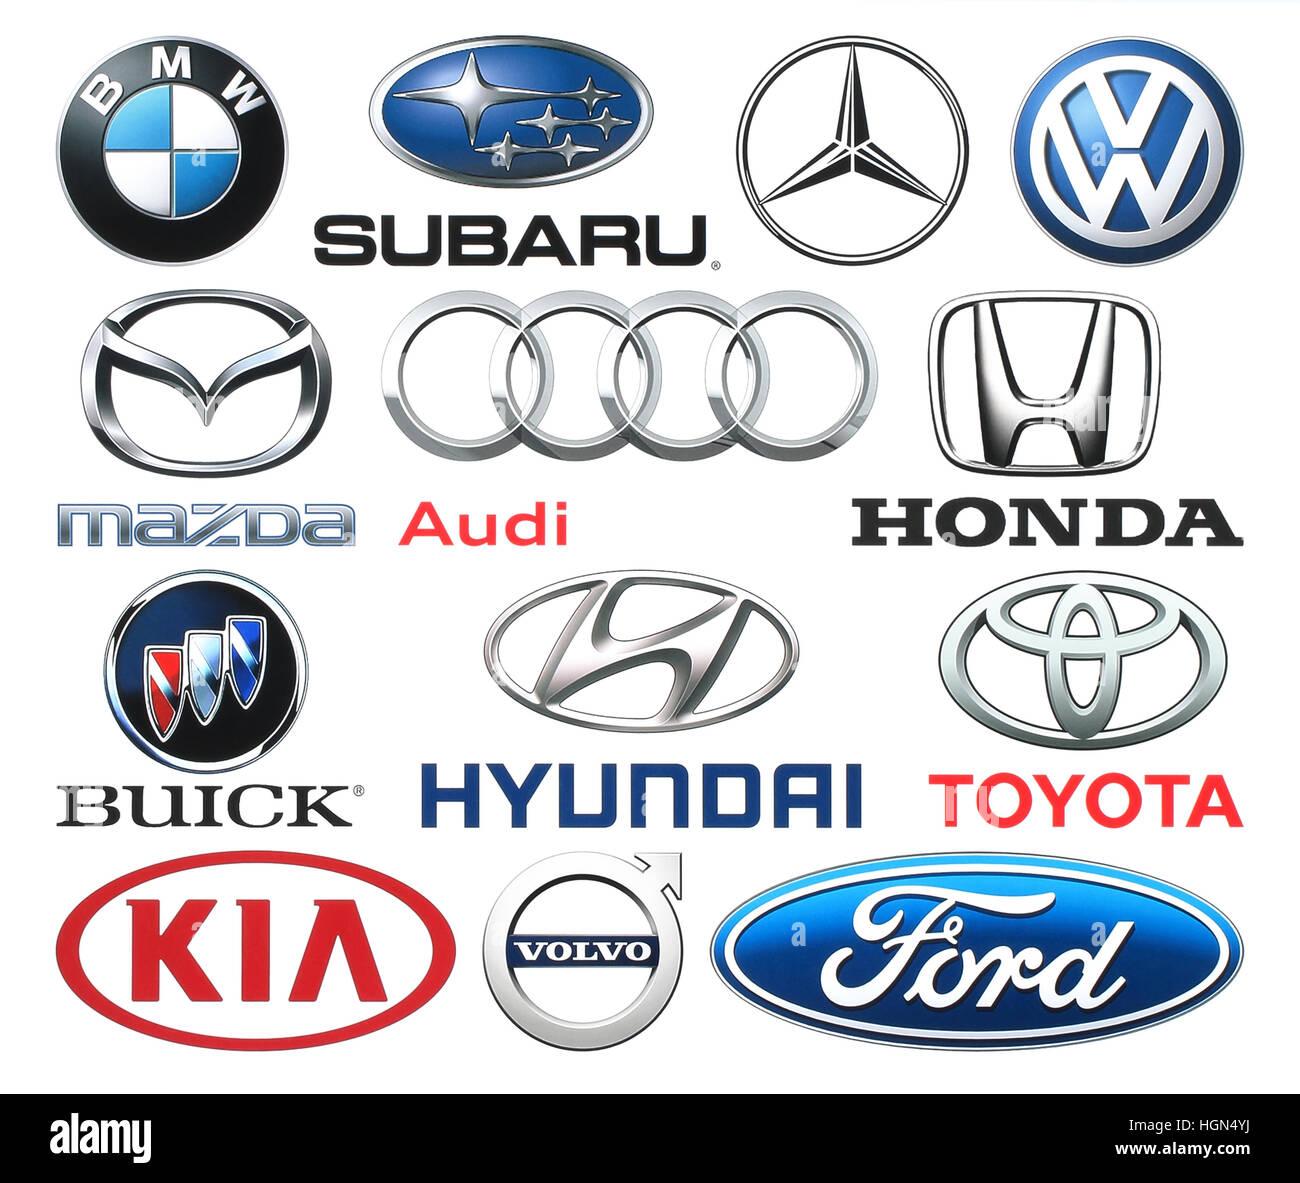 Kiev, Ukraine - June 03, 2016: Collection of popular car logos printed on white paper: Volkswagen, Audi, Subaru, - Stock Image